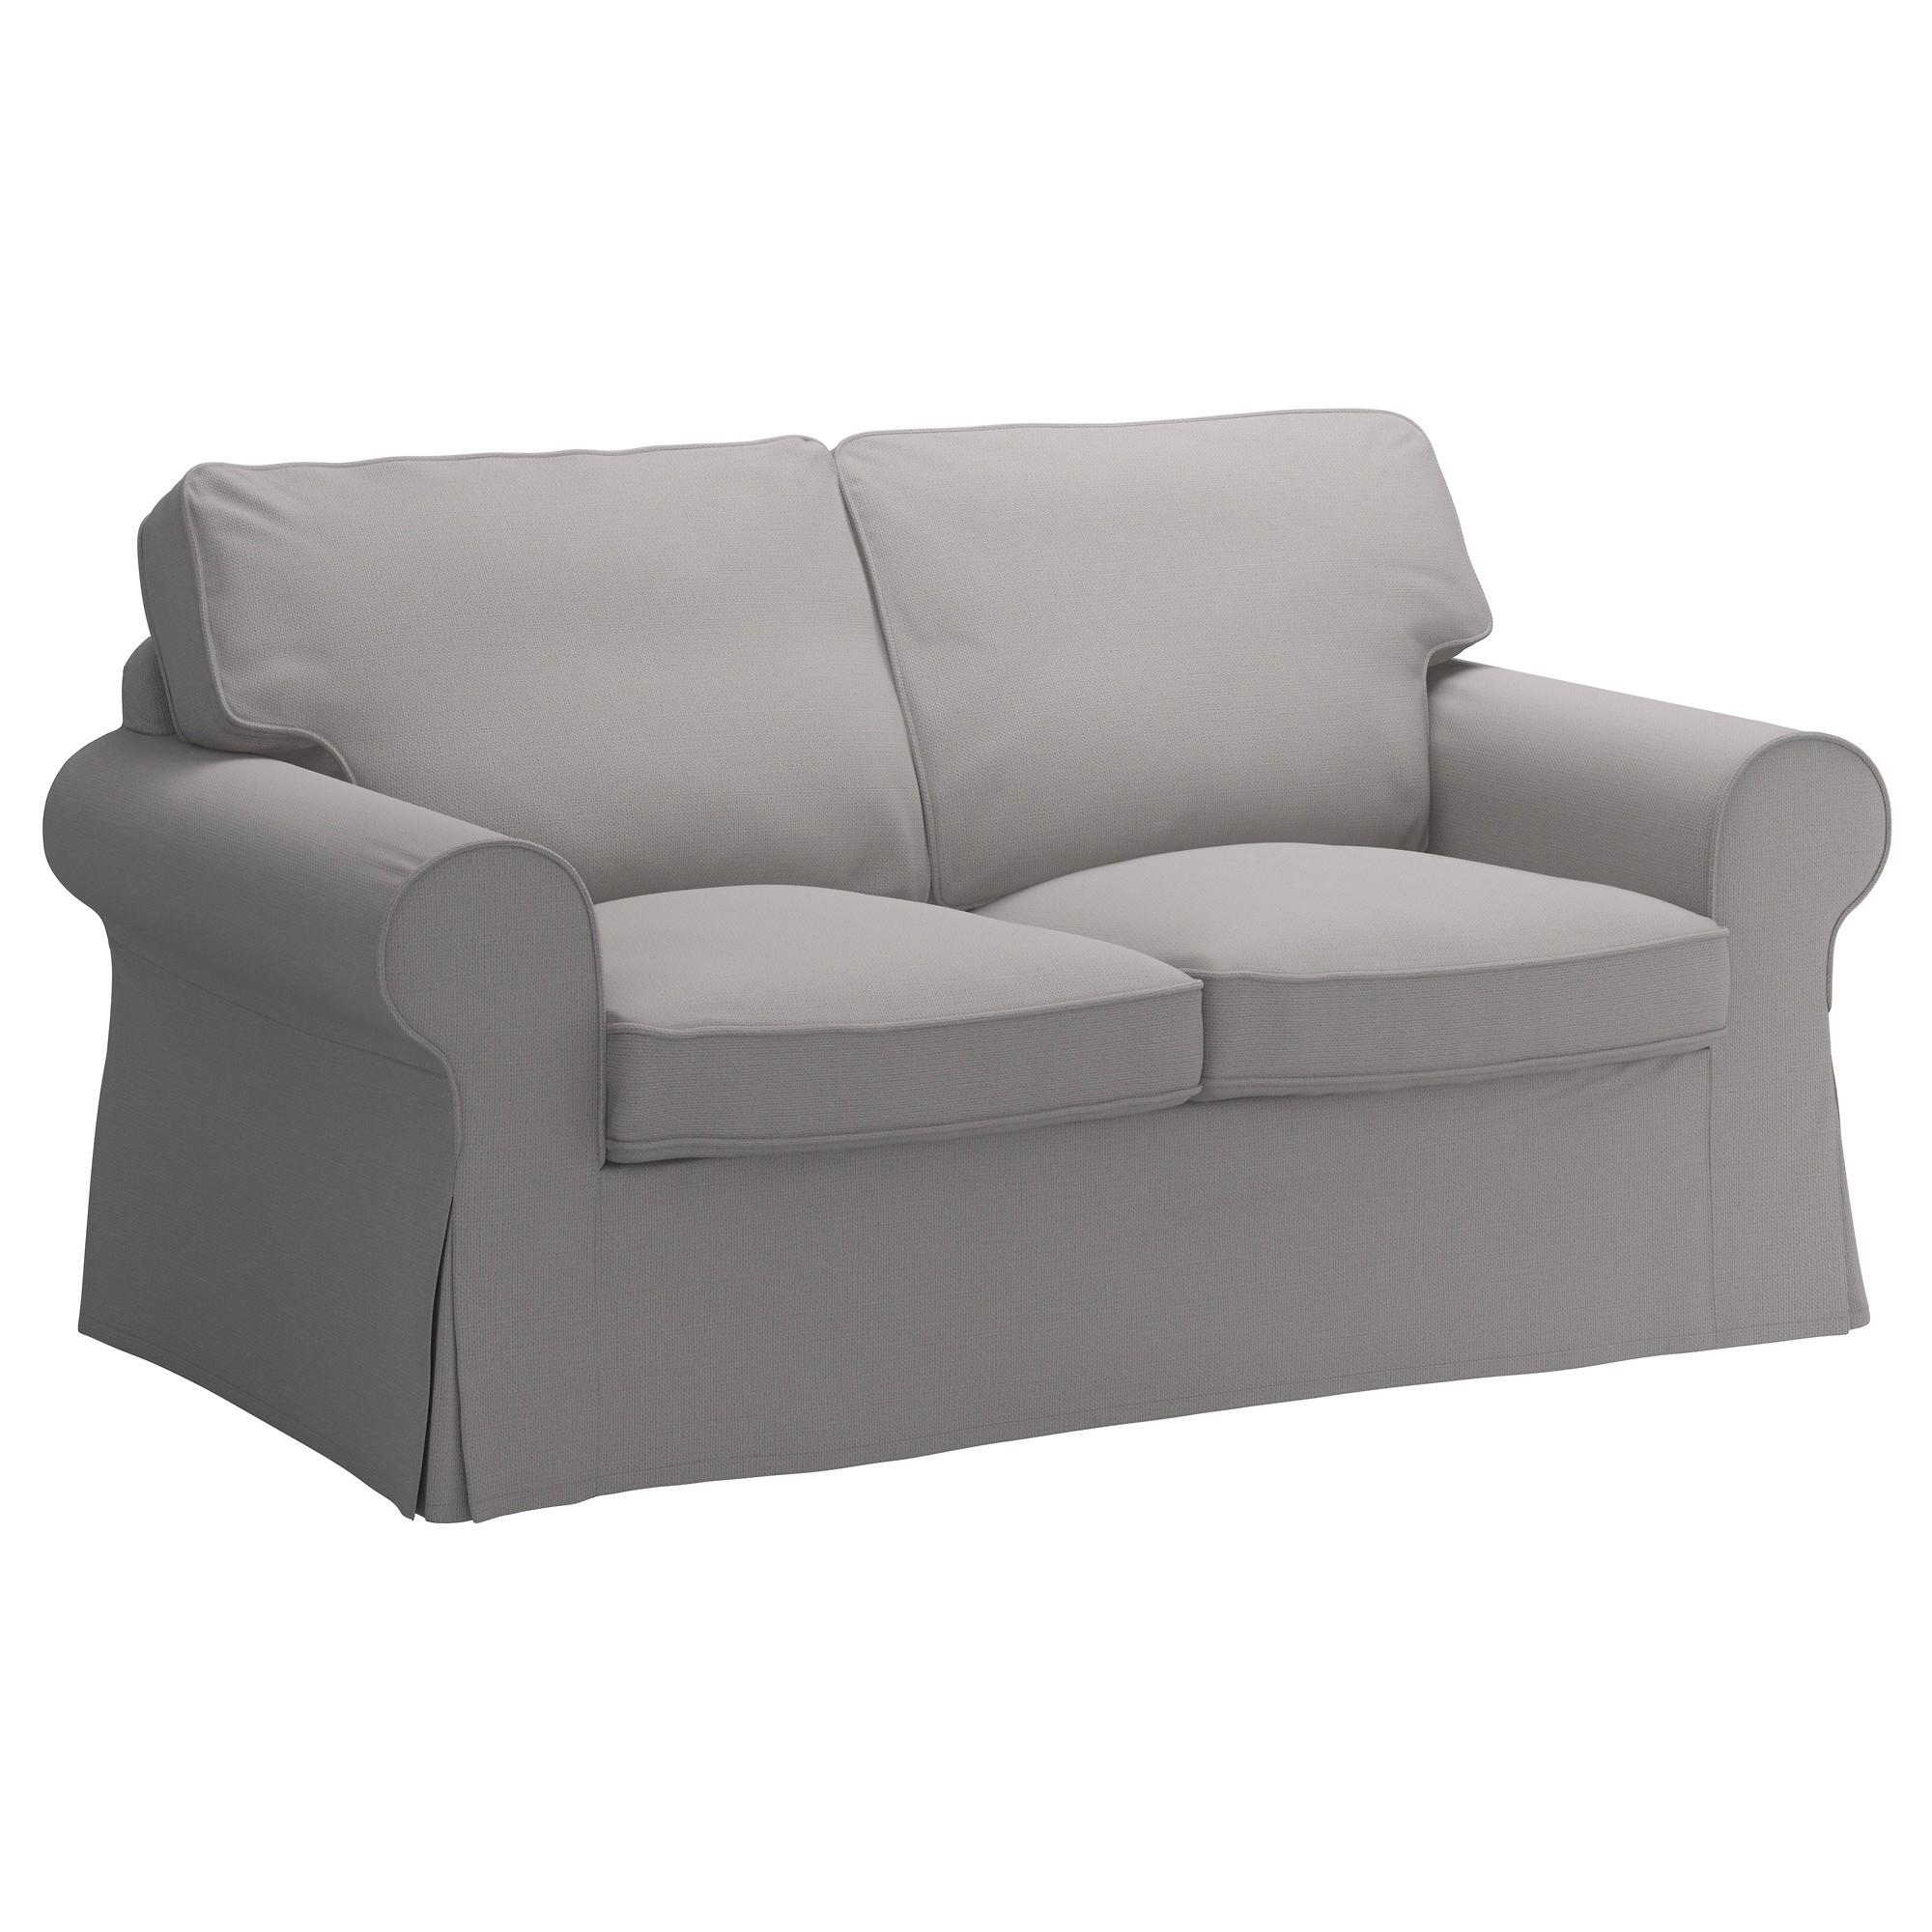 Canapes Convertibles Ikea Ektorp